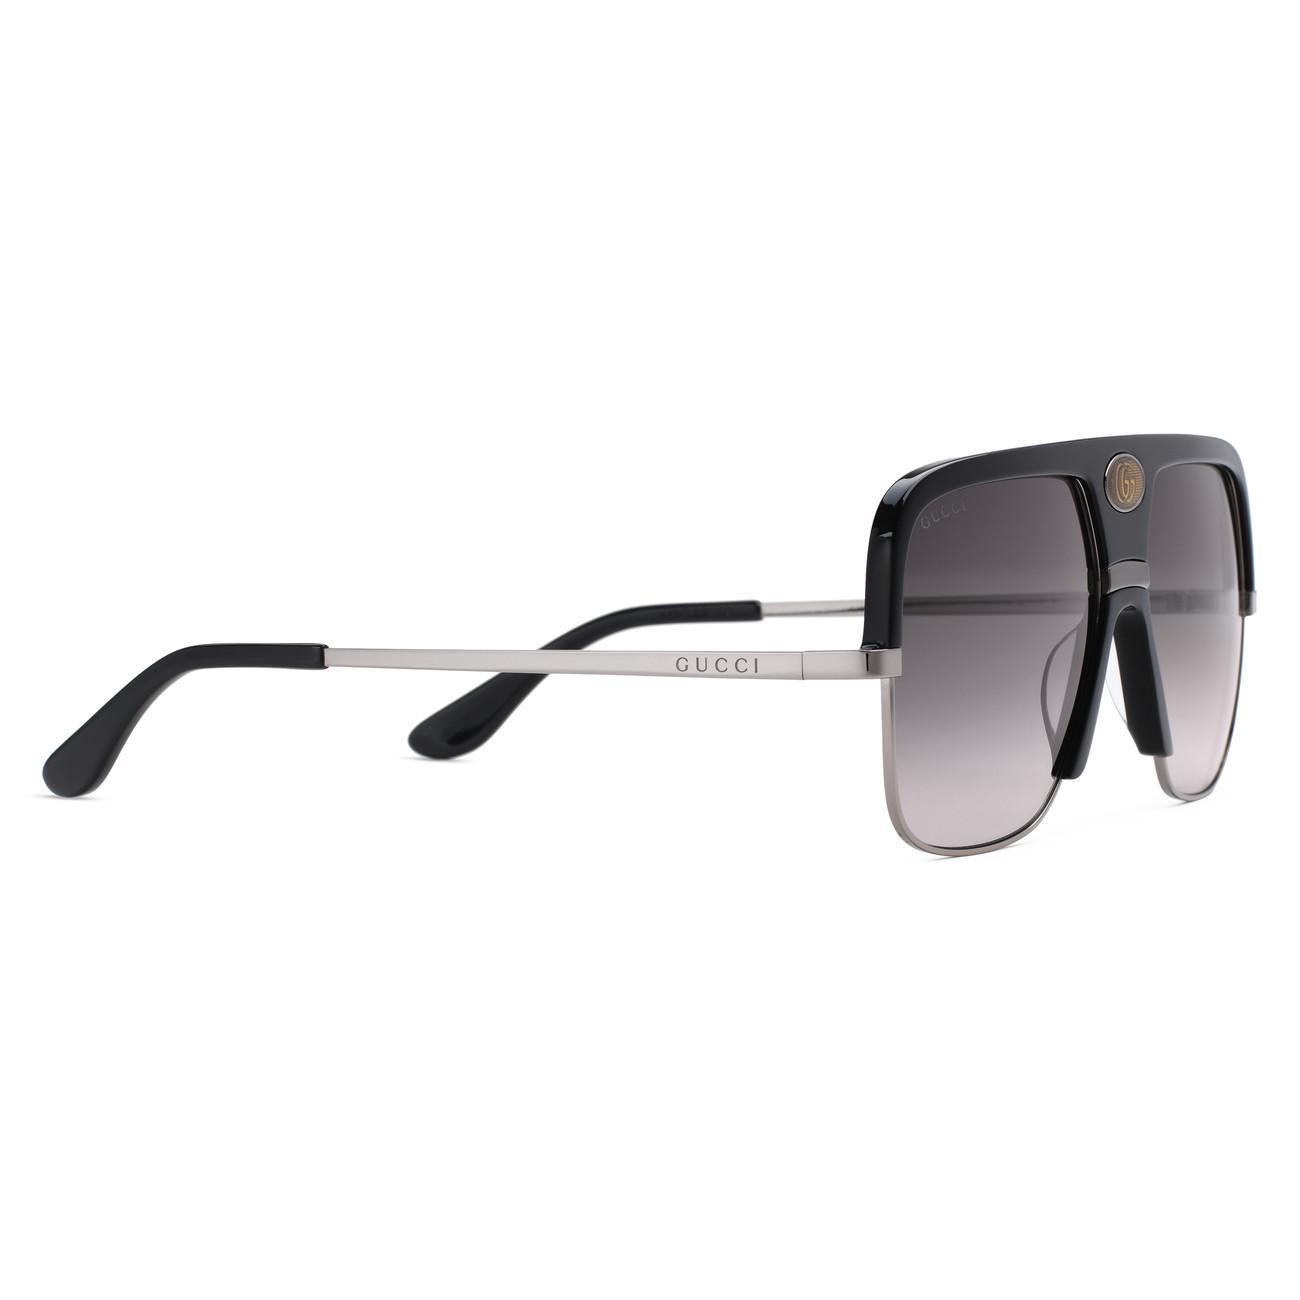 f11913242c7b ... Navigator Sunglasses With Double G for Men - Lyst. View fullscreen